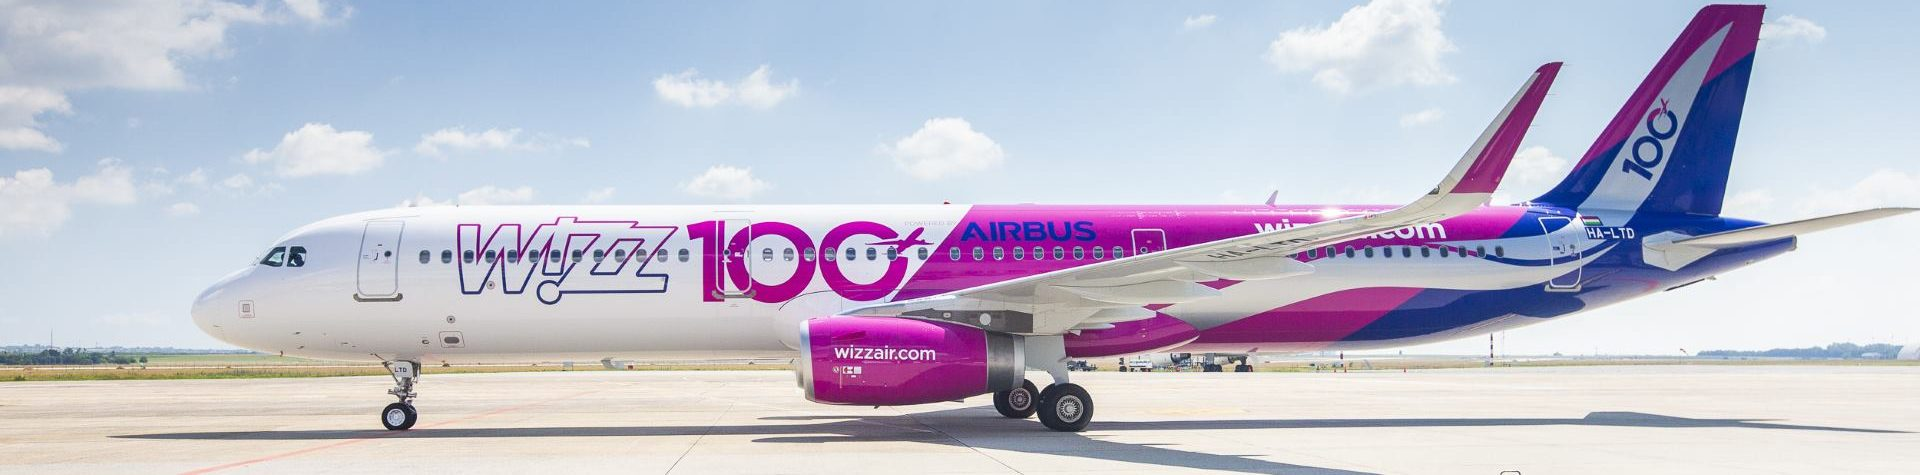 Wizz Air uveo stoti avion u svoju flotu